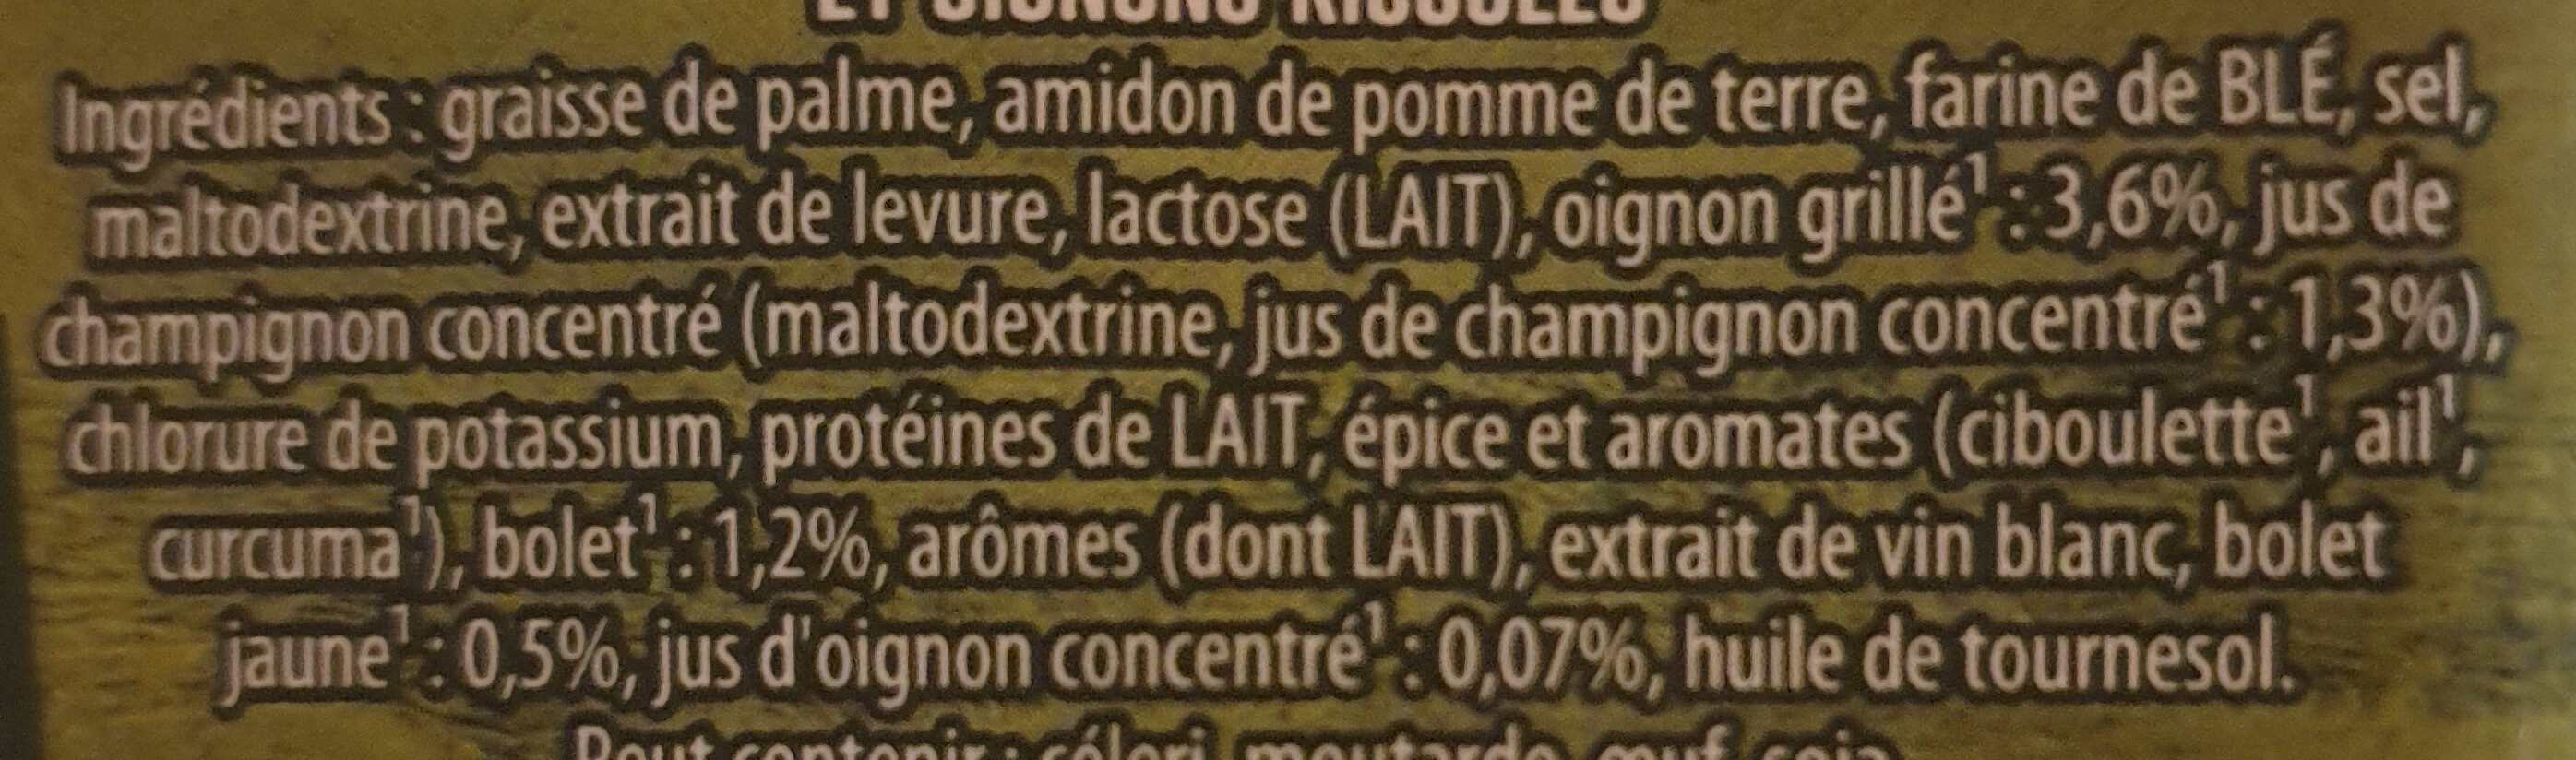 Knorr Soupe Forestière Champignons 85g 3 Portions - Ingrediënten - fr